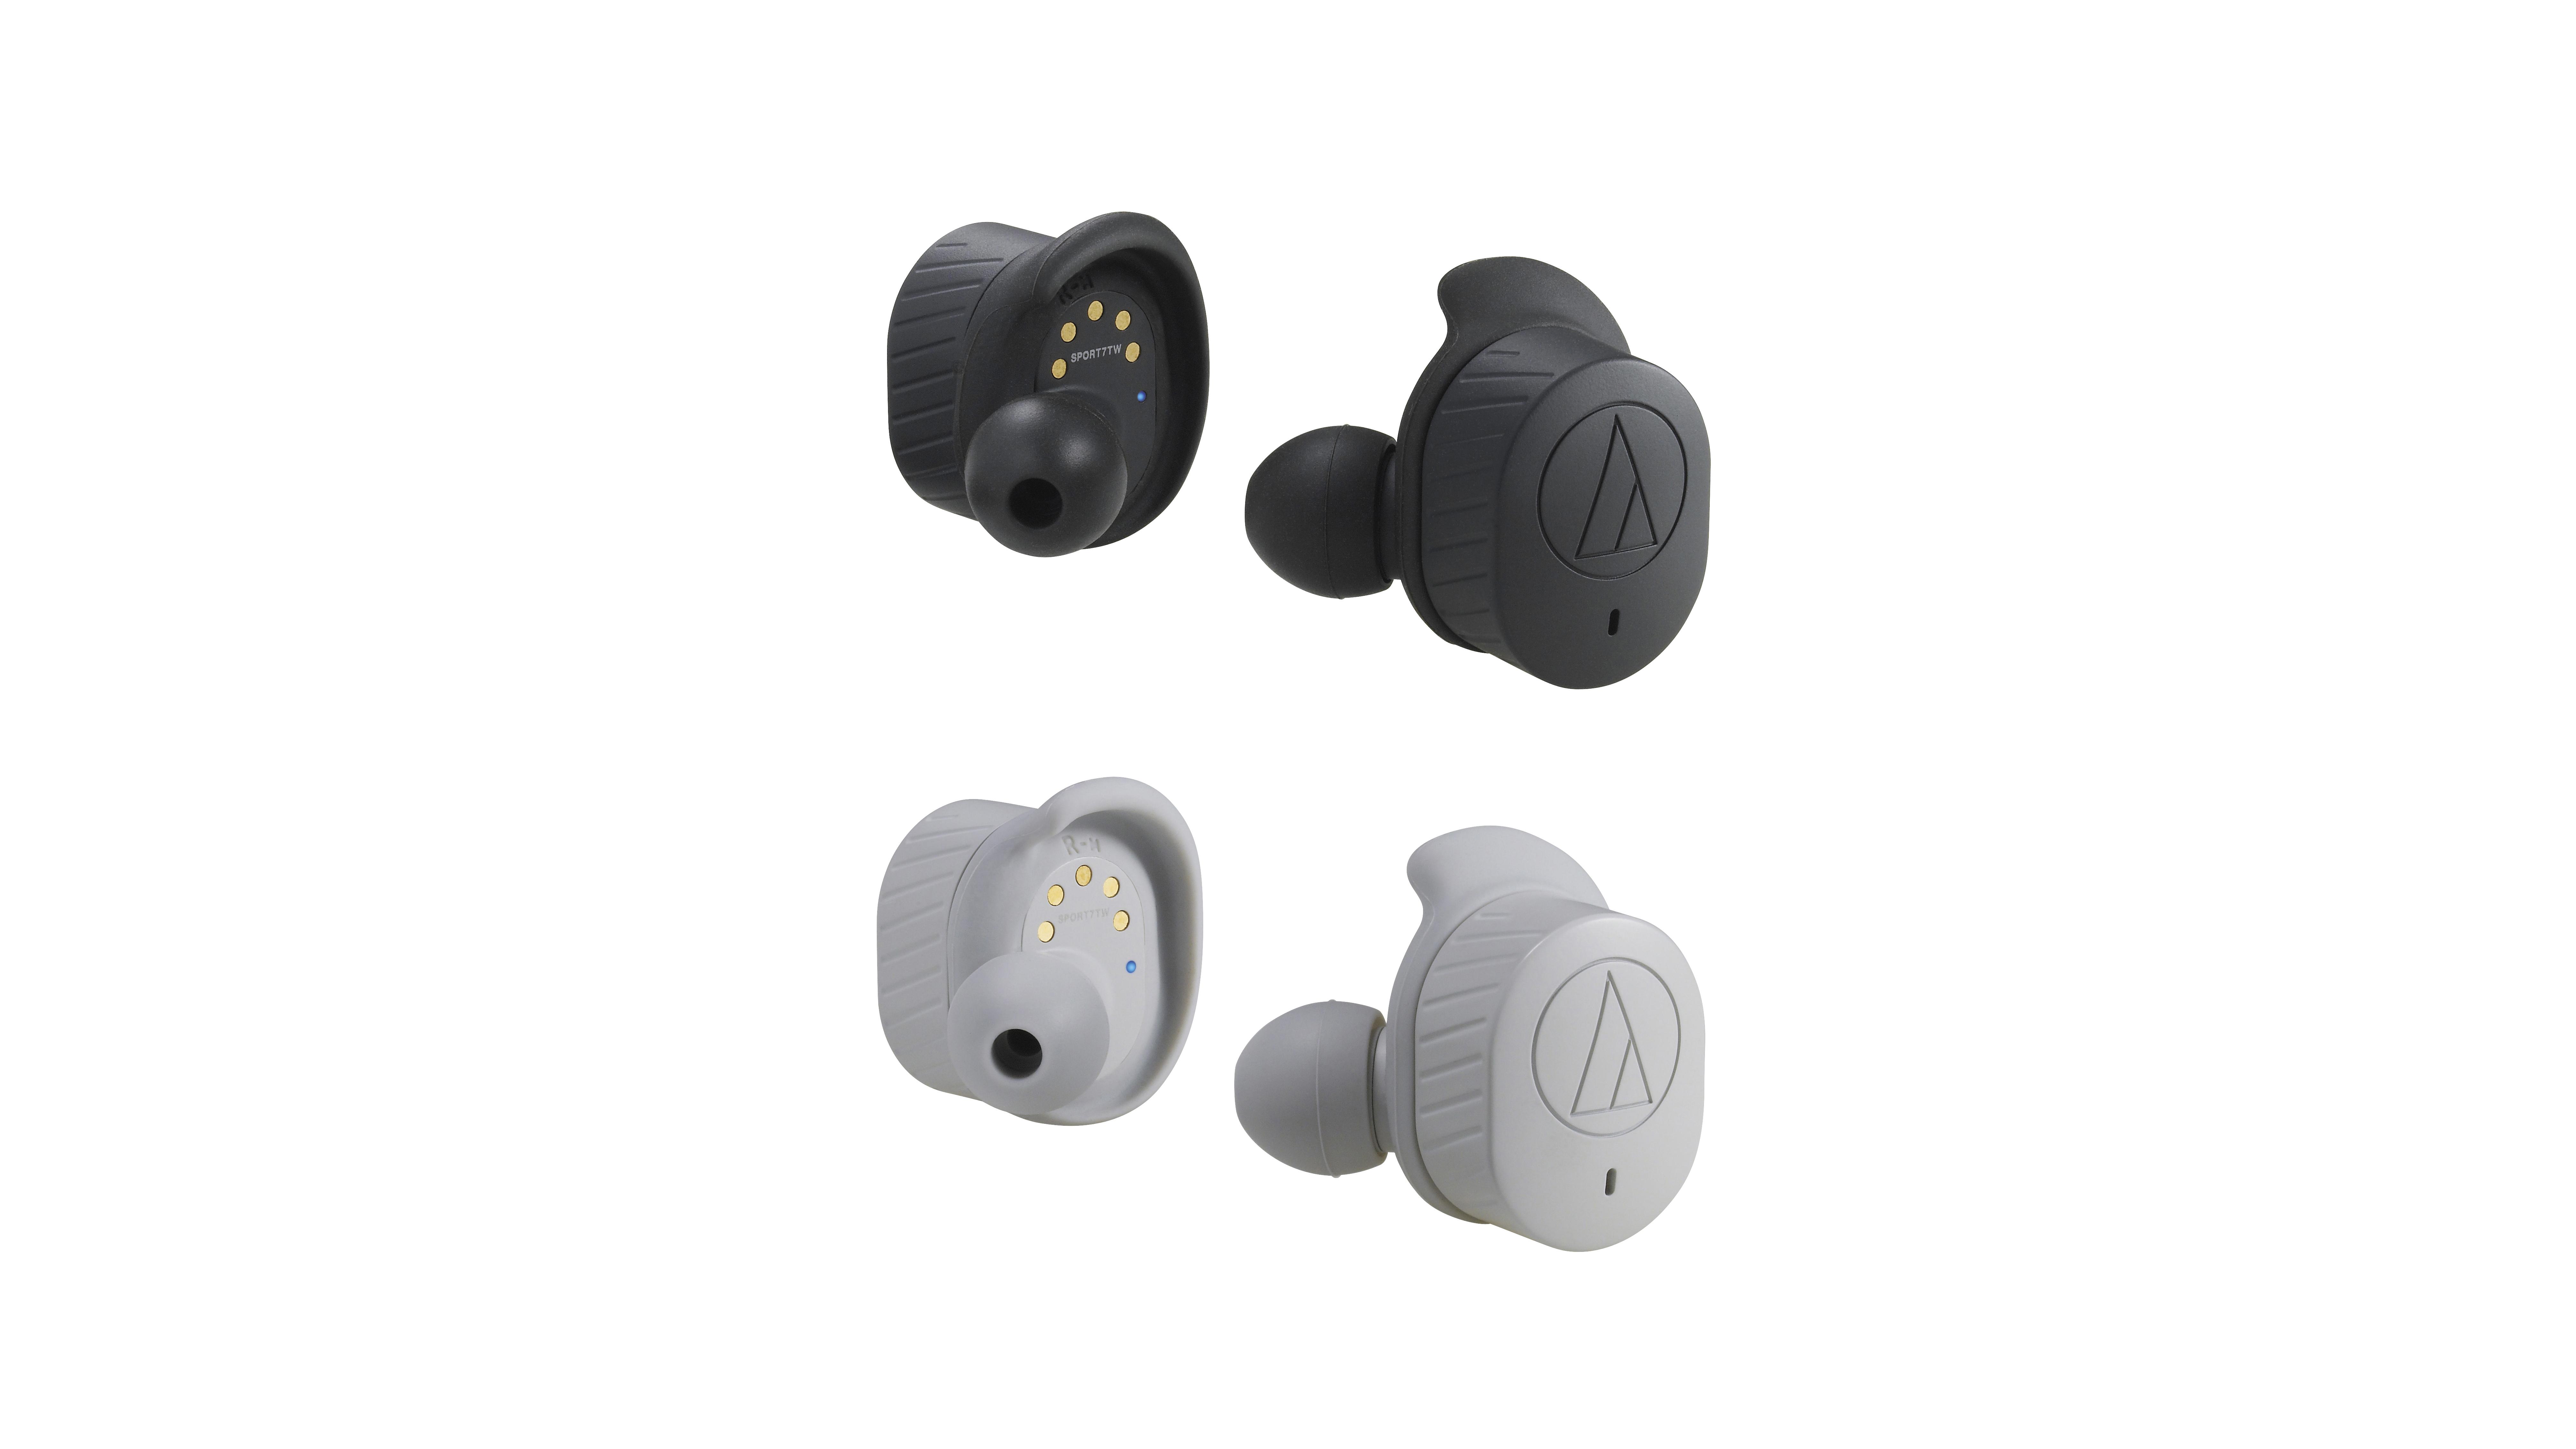 Audio Technica announces new in-ear headphones with true wireless tech